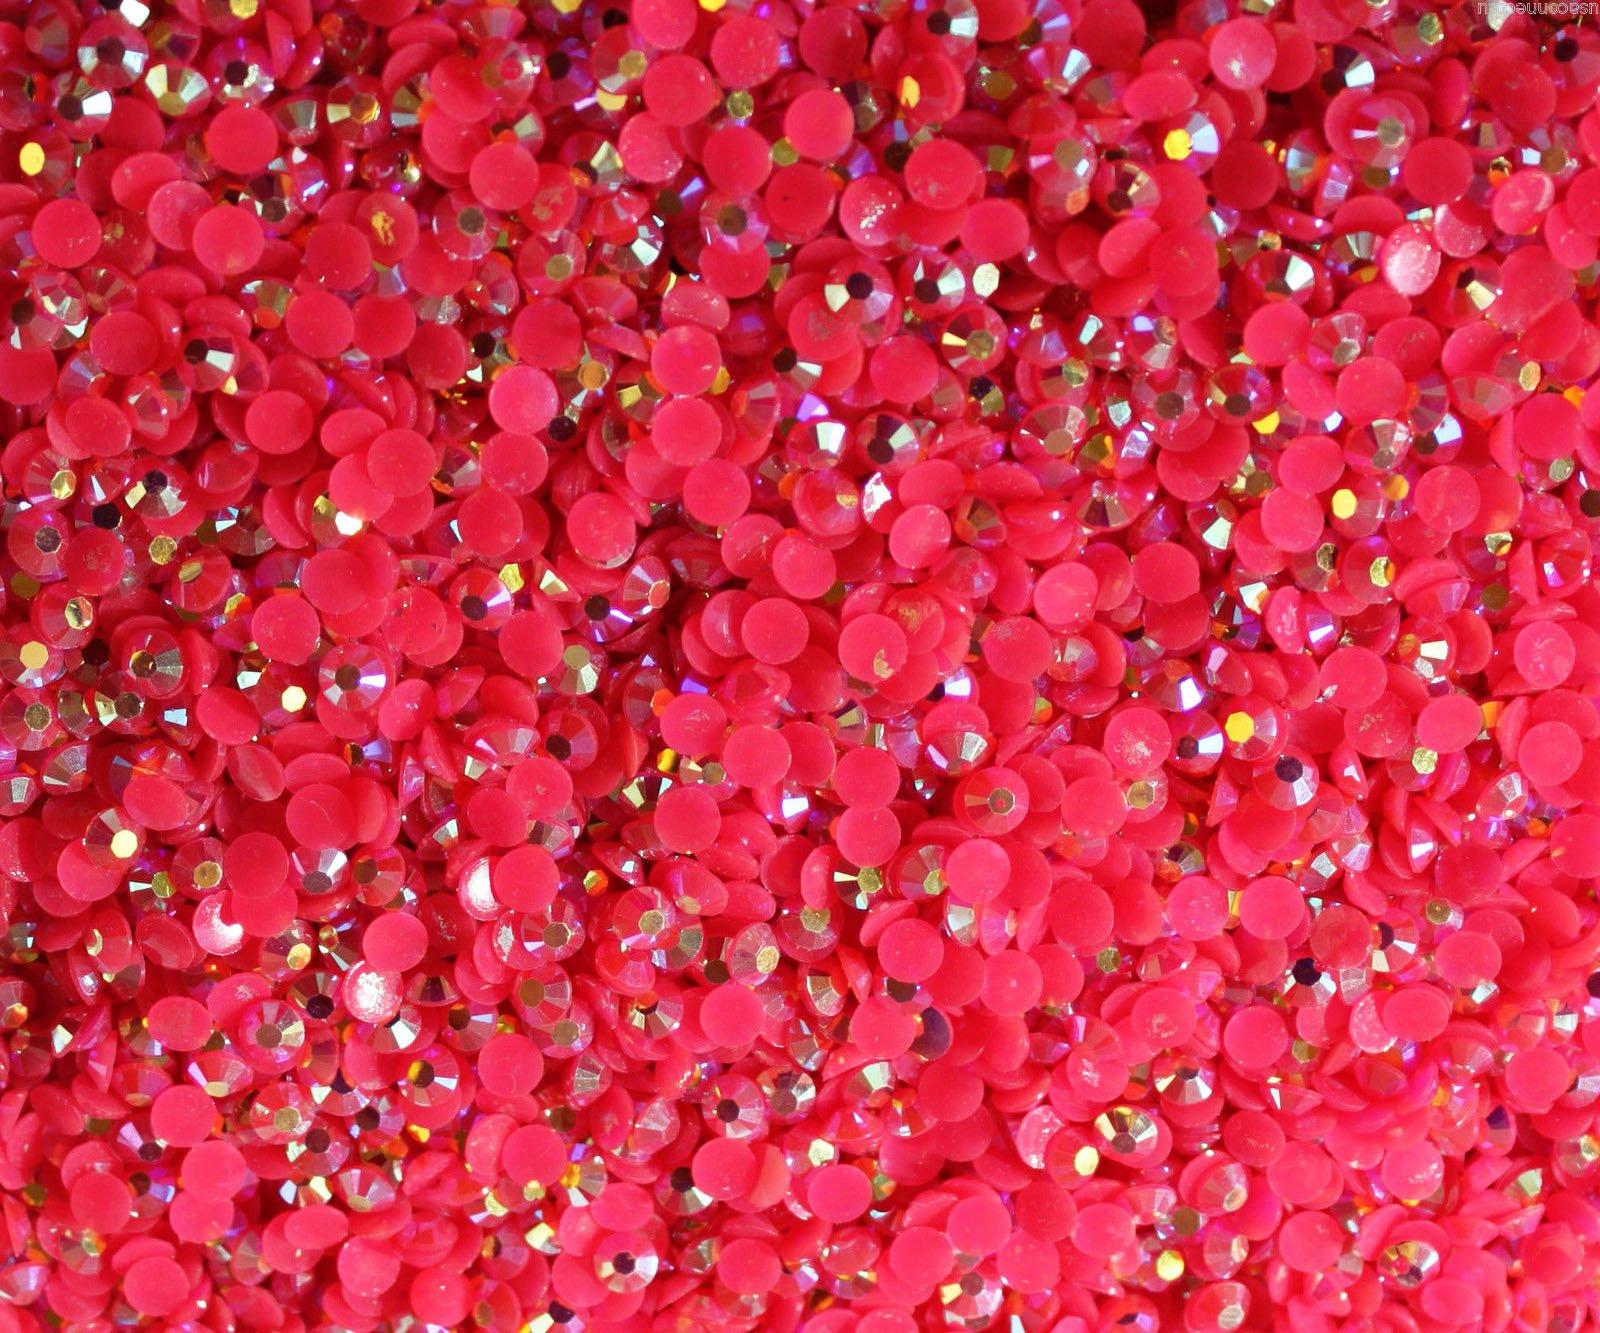 "100% Custom Made (4mm) 1000 Bulk Pieces of Mini Size ""Glue-On"" Flatback Embellishments for Decorating, Made of Acrylic Resin w/ Shiny Iridescent Crafting Rhinestone Crystal Fuchsia Gem Style {Pink}"